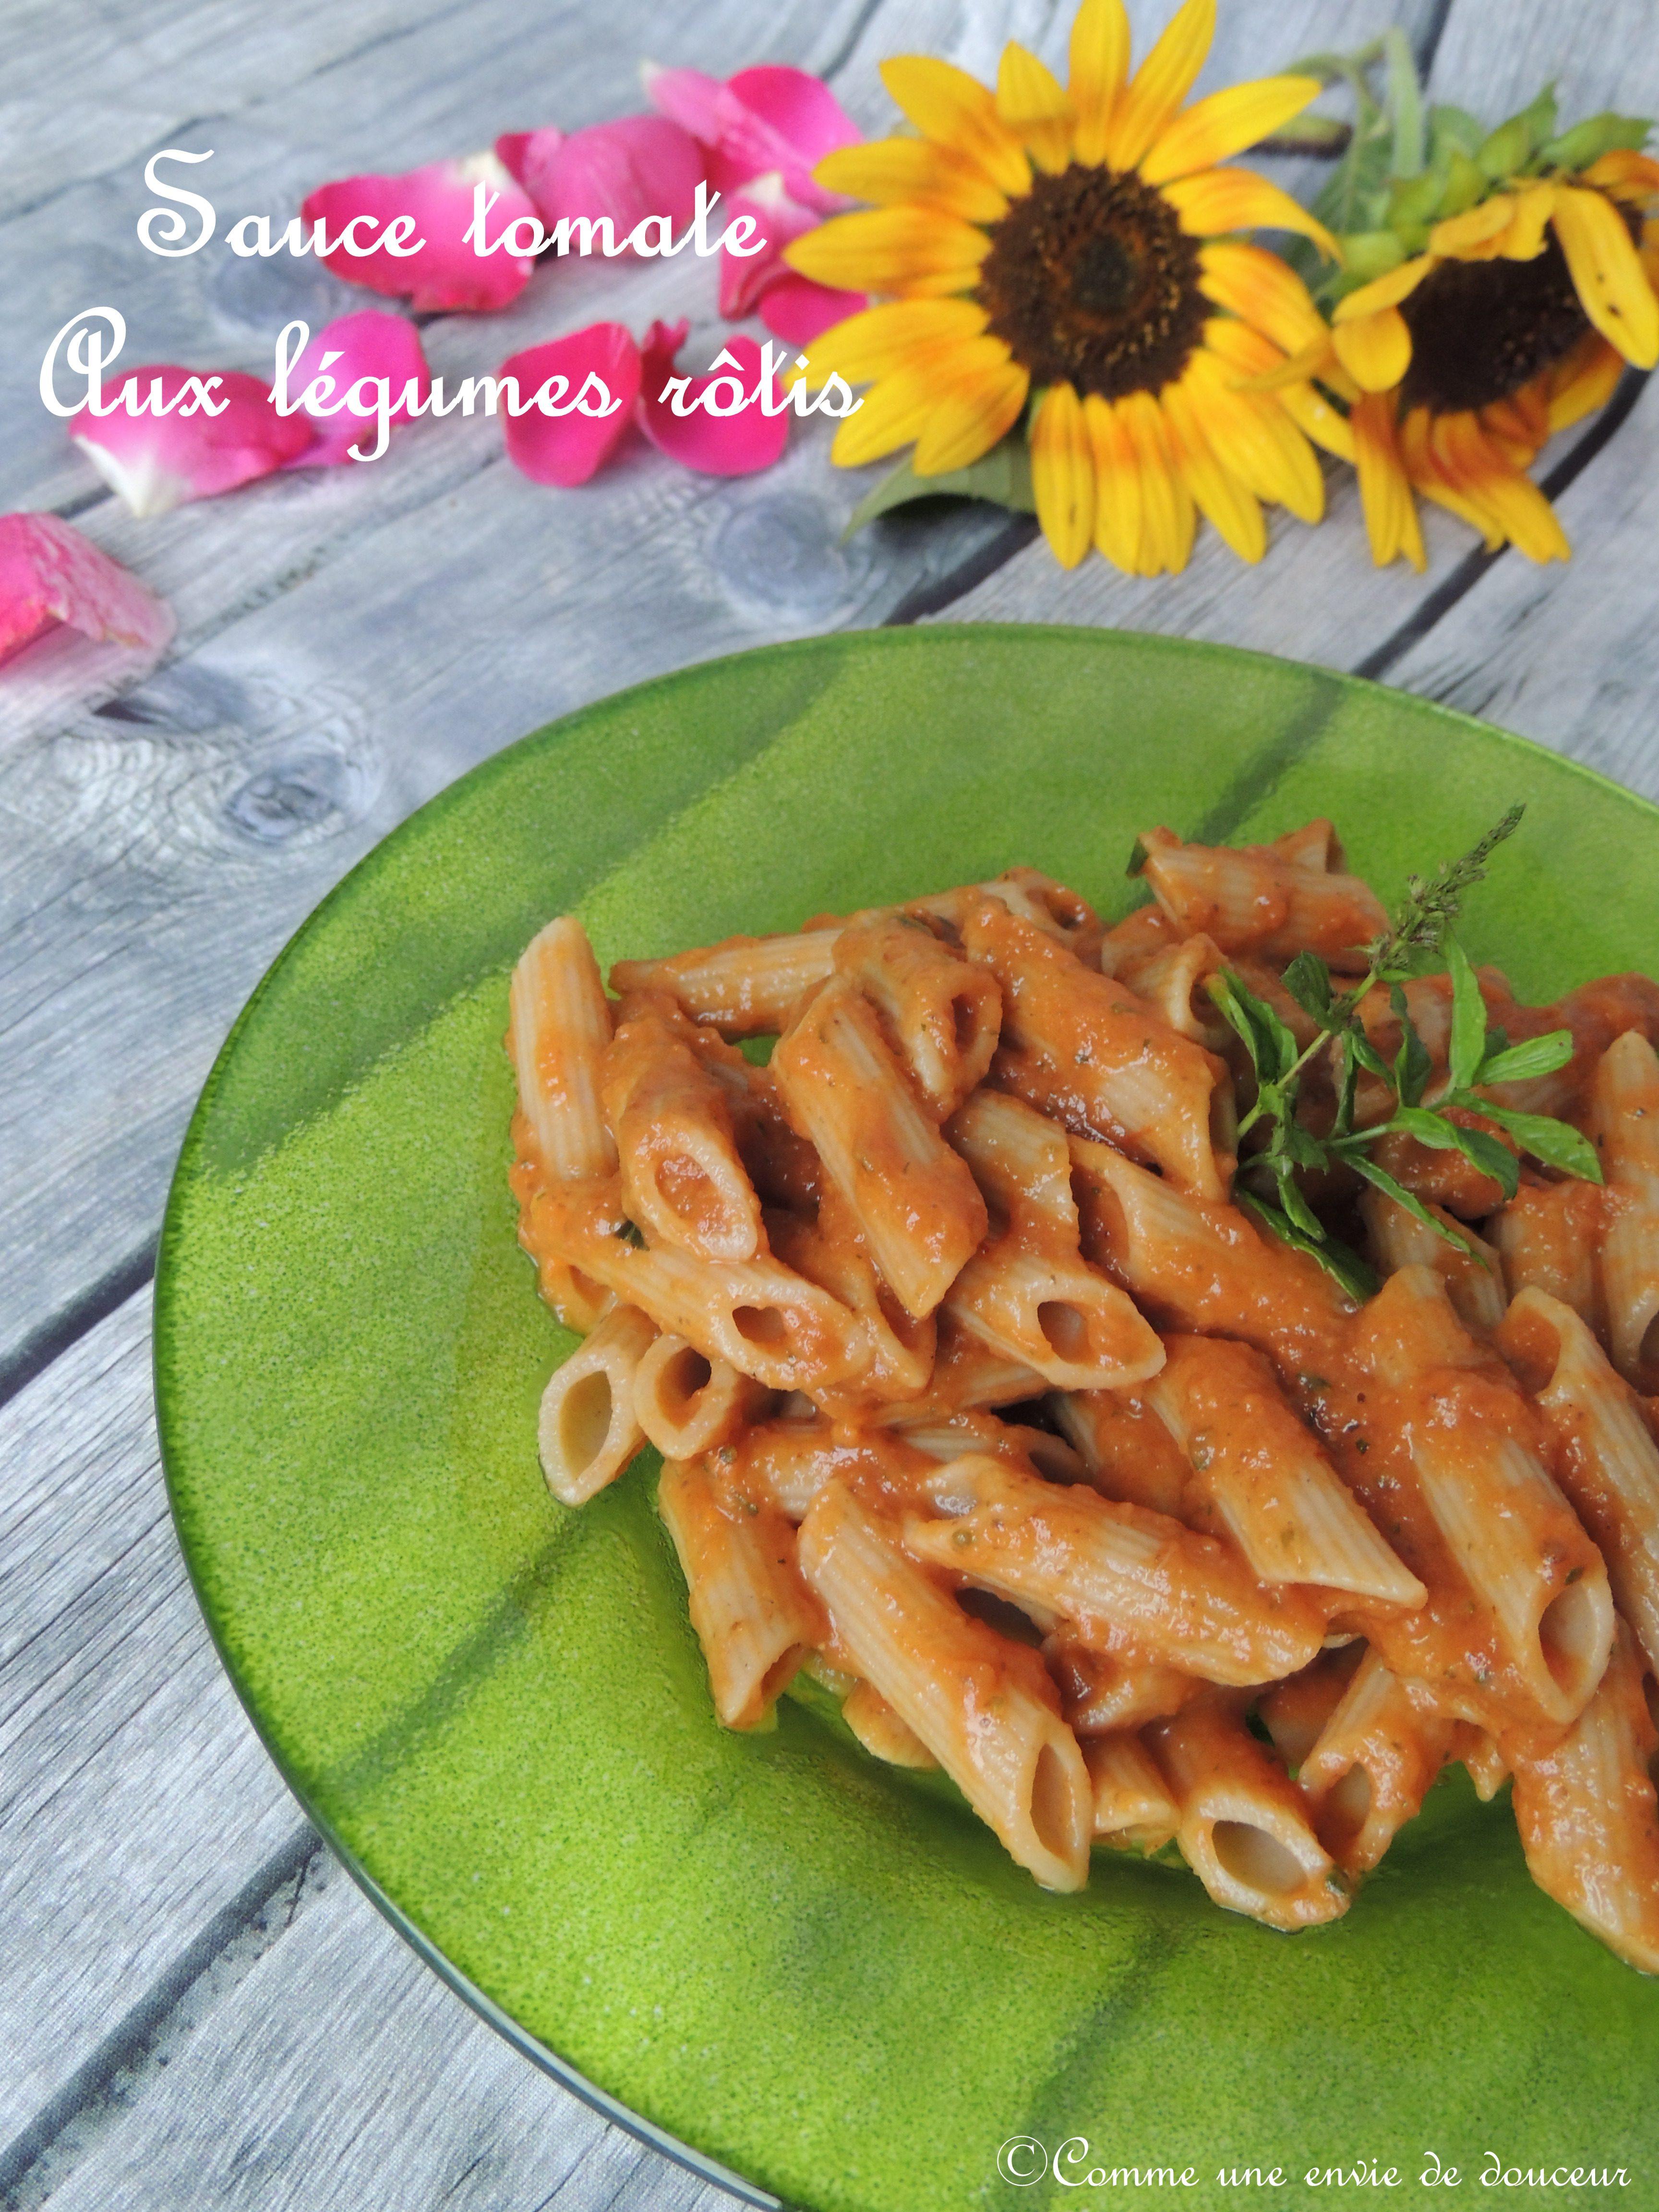 Sauce tomate aux légumes rôtis – Roasted veggies tomato sauce